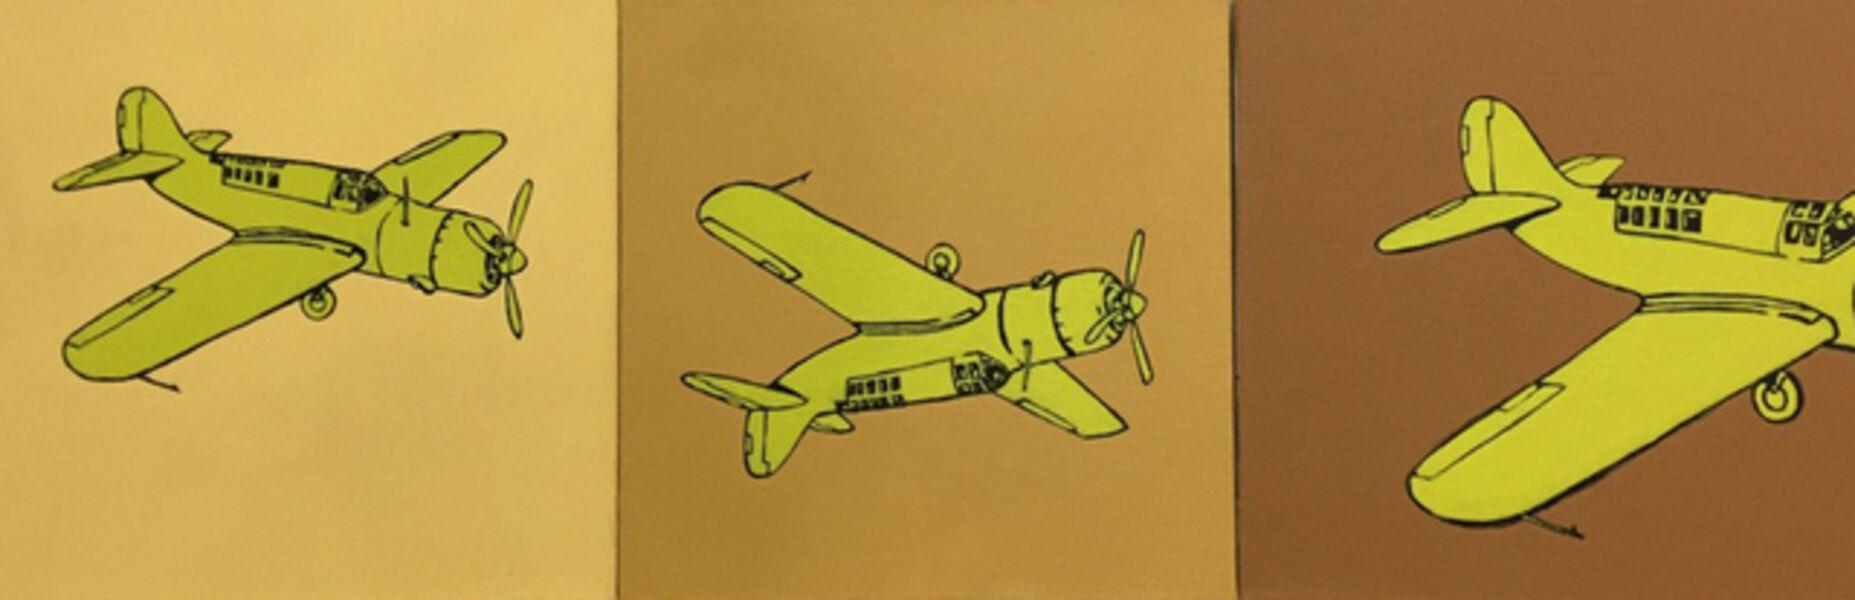 Charles Buckley, 'Airplane', 2015